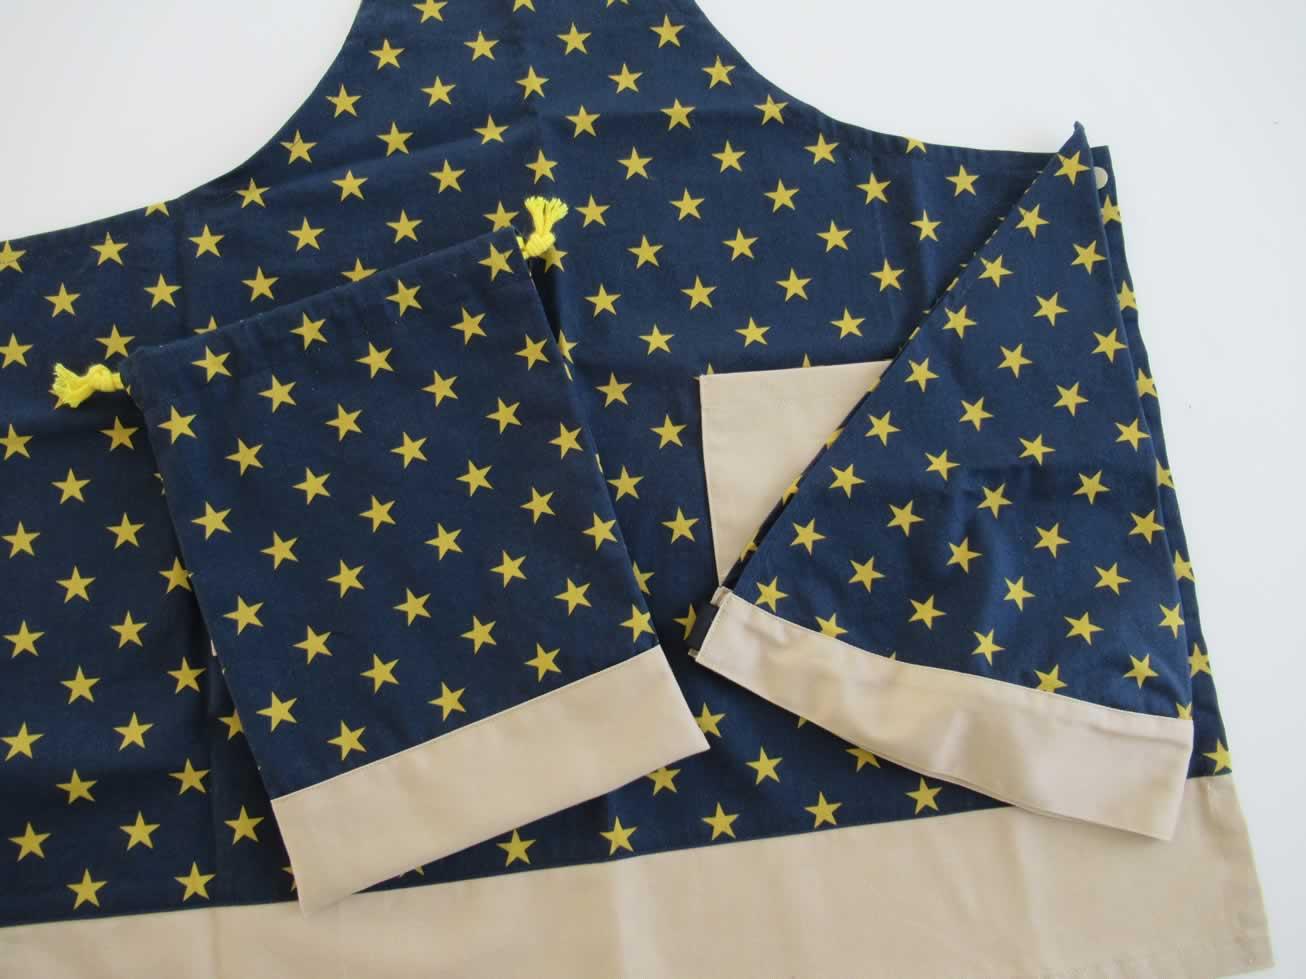 三角巾と収納袋